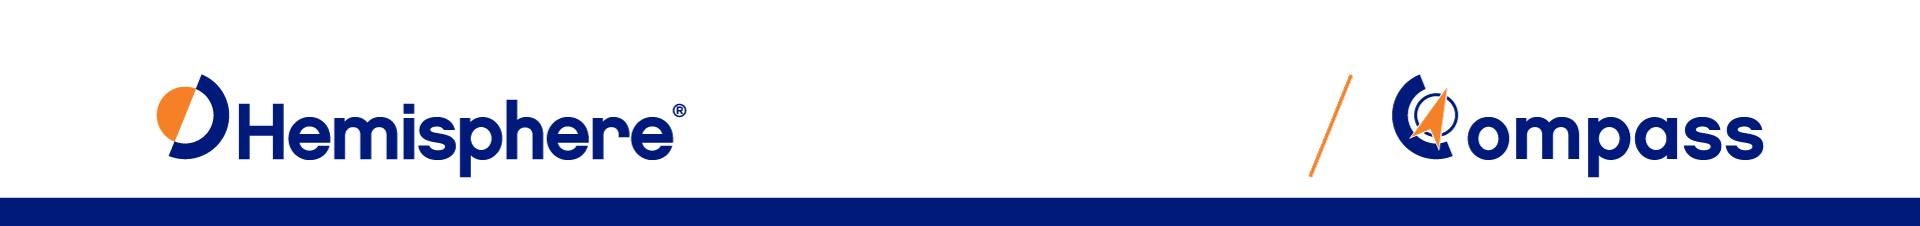 Hemisphere Awarded ISO 9001:2015 Certification